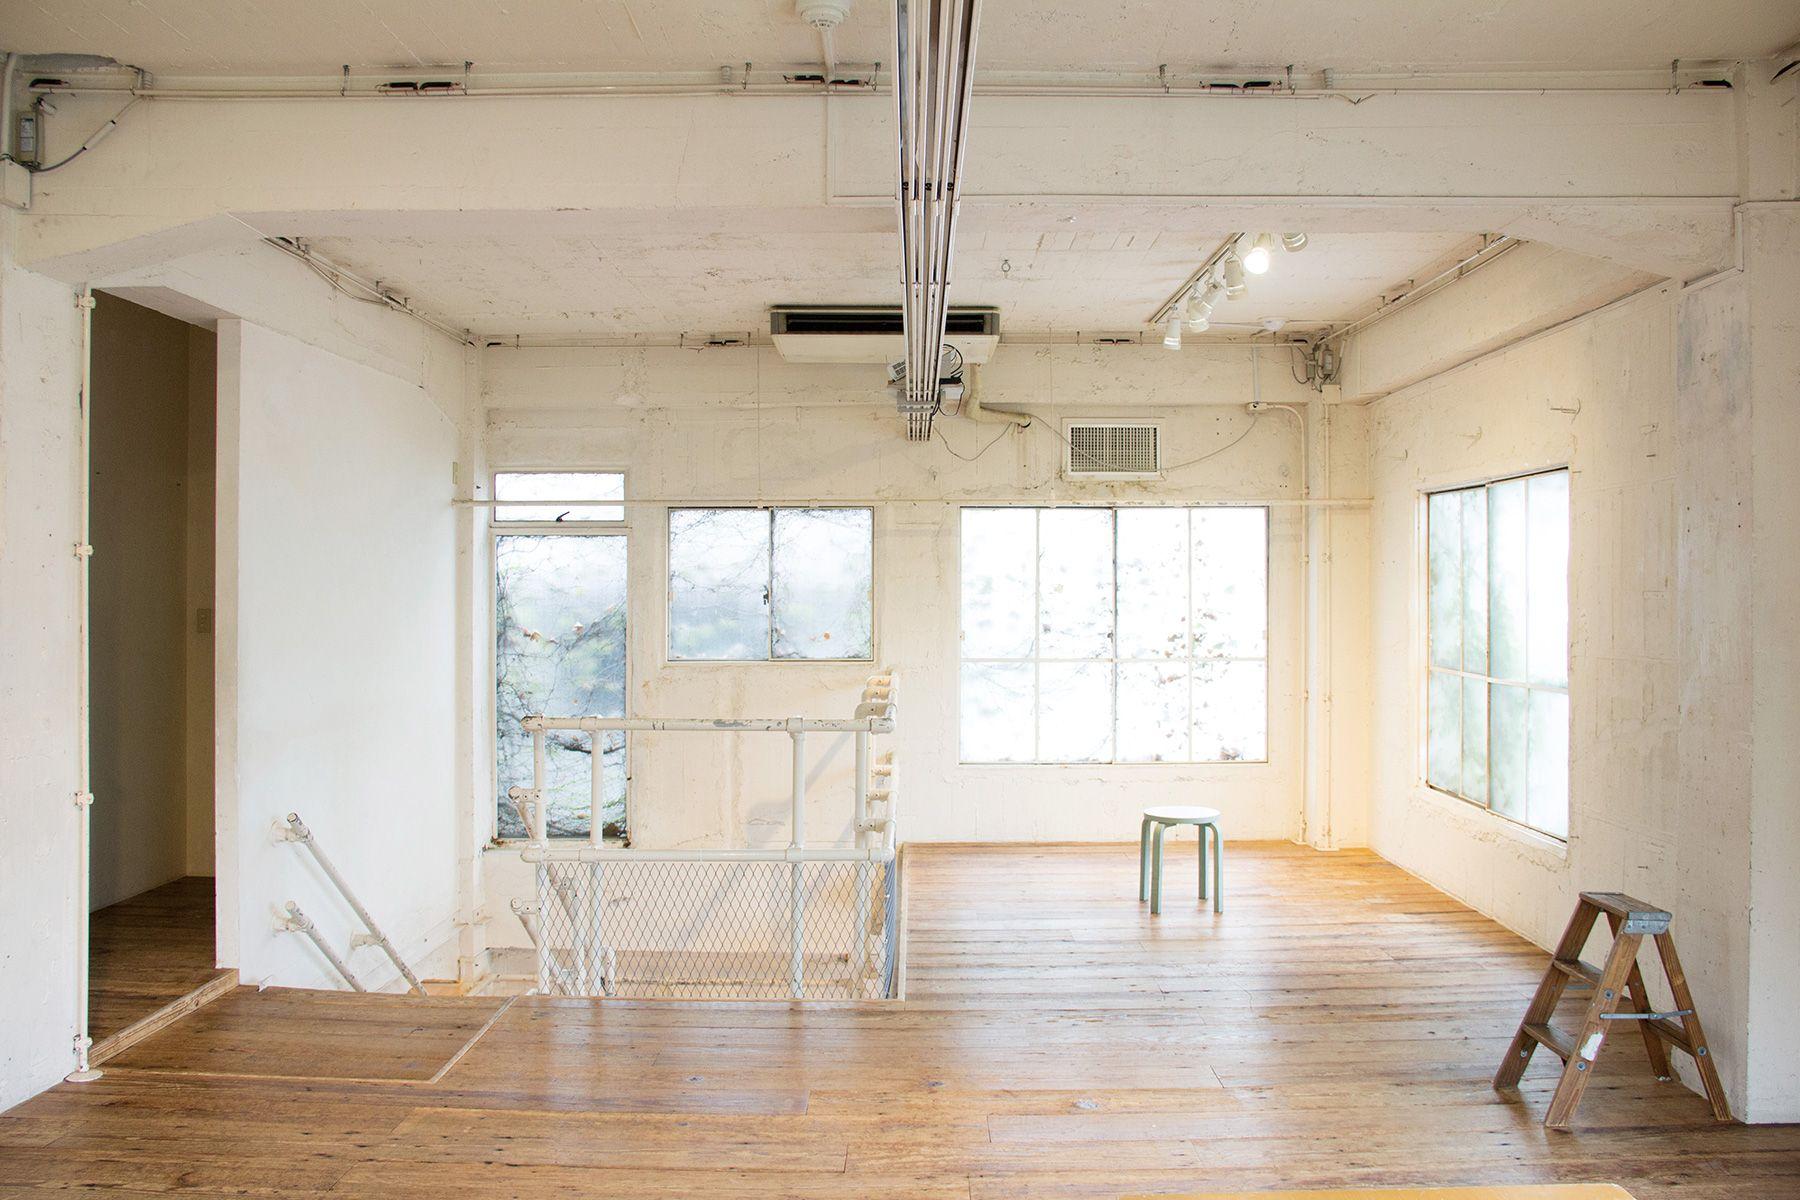 LIGHT BOX STUDIO 青山 2F (ライトボックススタジオ)プロジェクターがあります